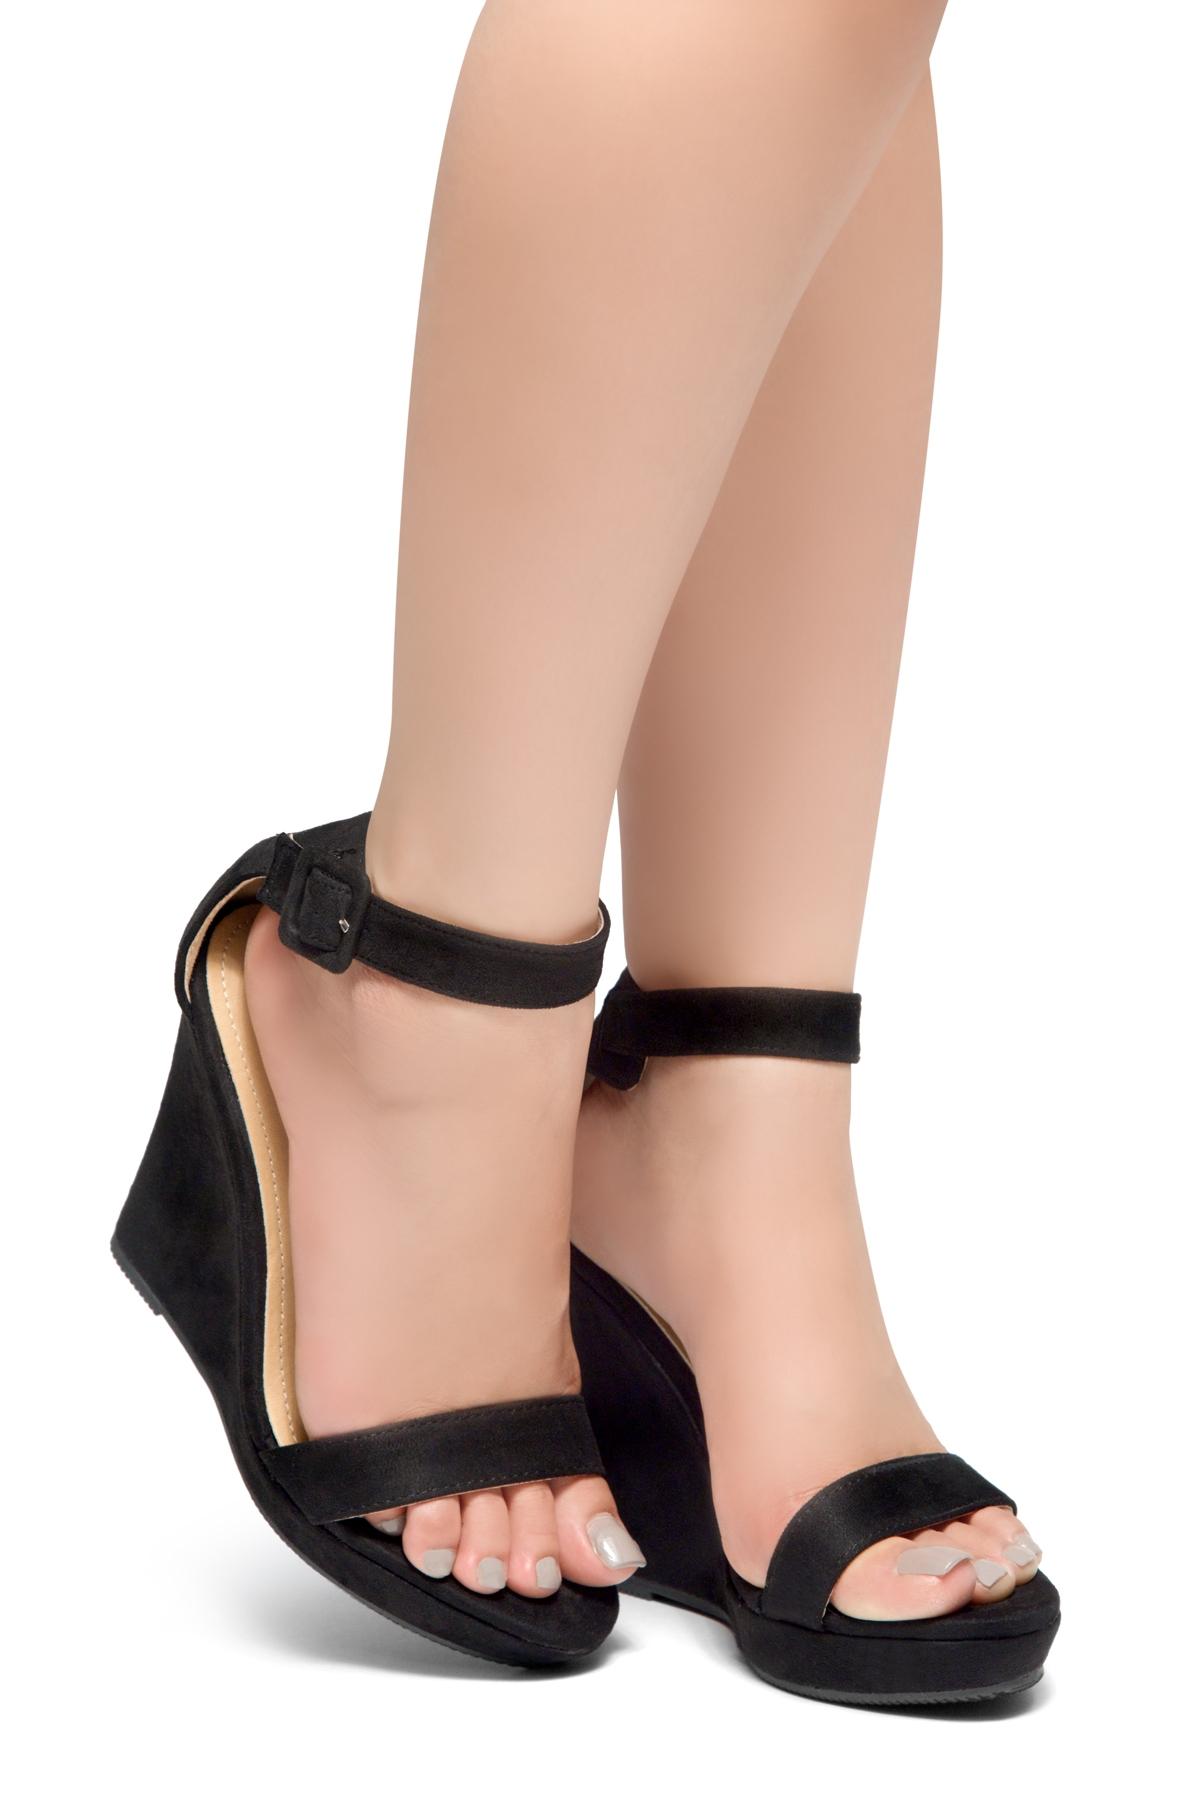 aad0eb8d7fa HerStyle Forever Together-Ankle Strap Open Toe Platform Wedge (Black)